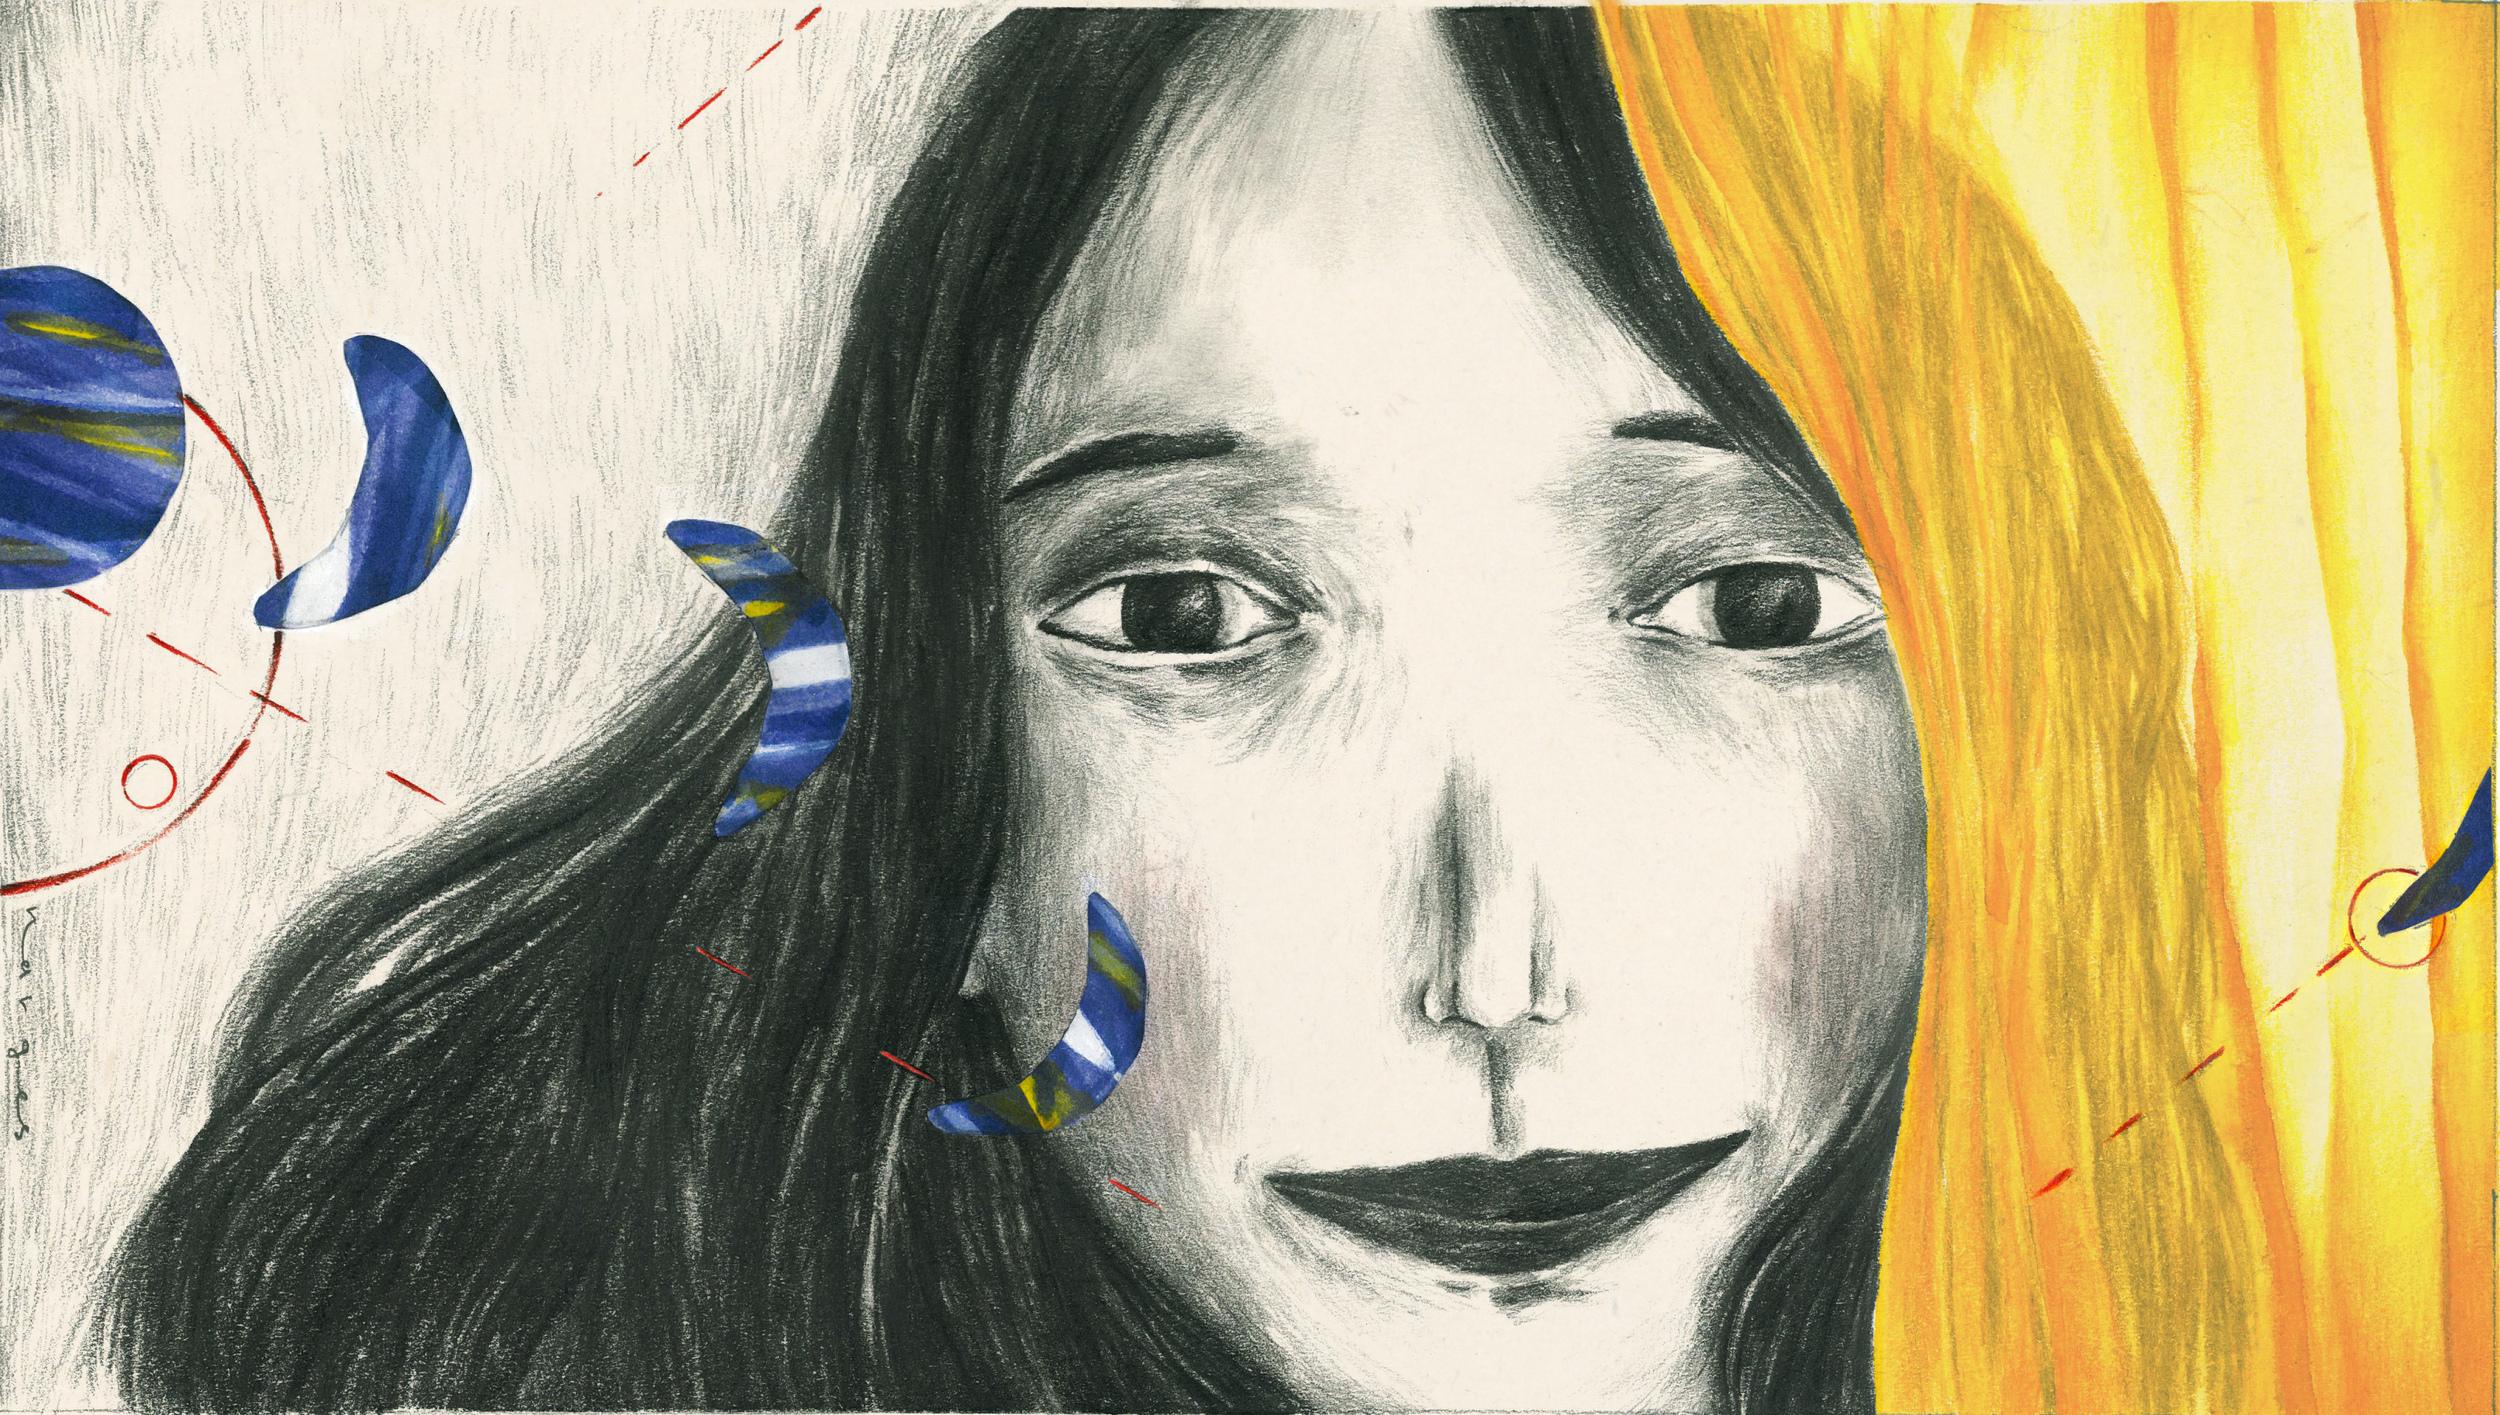 Art byNarges (Hasmik) Mohammadi